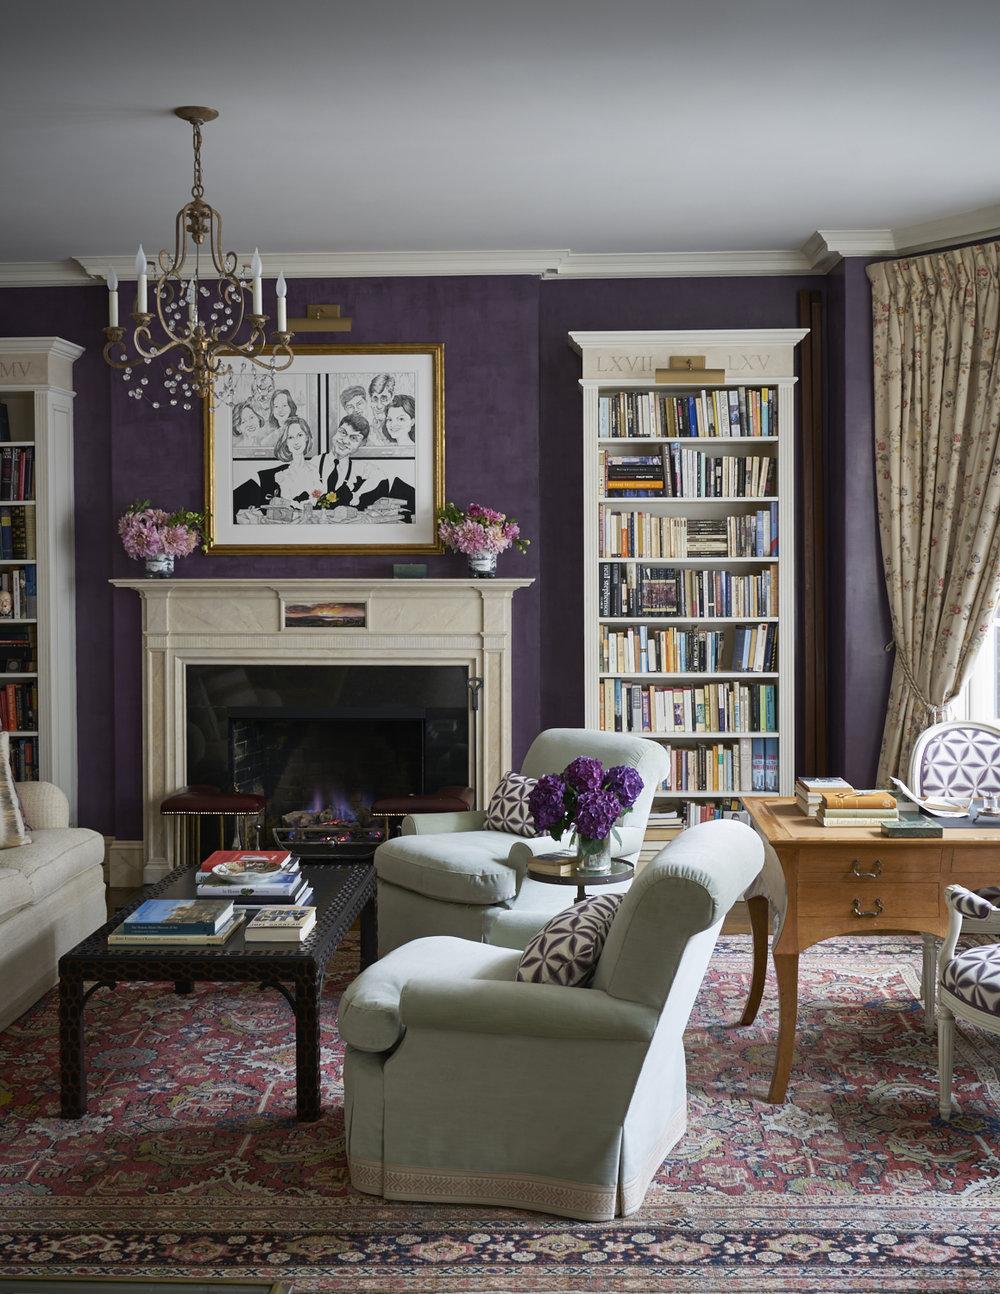 4 Living Room 4 HB_Katie_Lydon_Rubin_Residence_009 copy.jpg